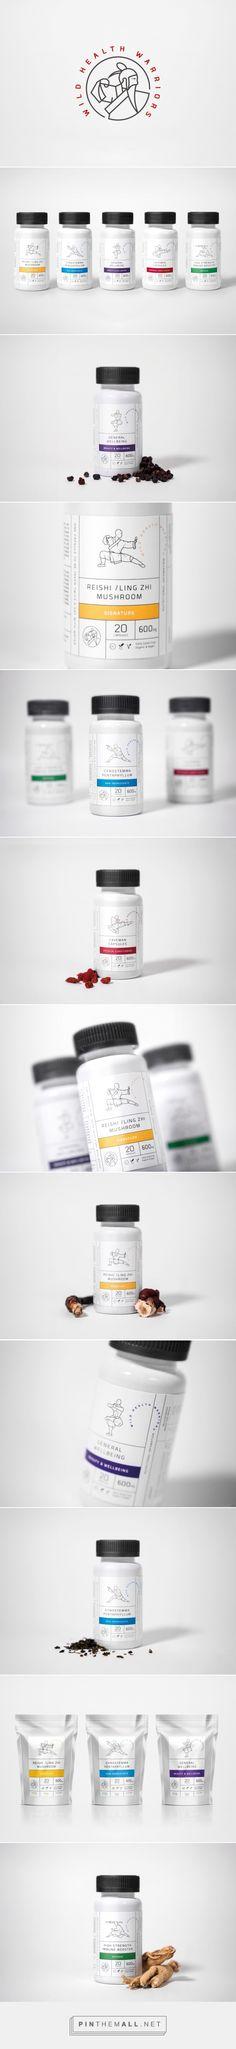 Wild Health Warriors packaging design by Arobase Creative - http://www.packagingoftheworld.com/2016/12/wild-health-warriors.html